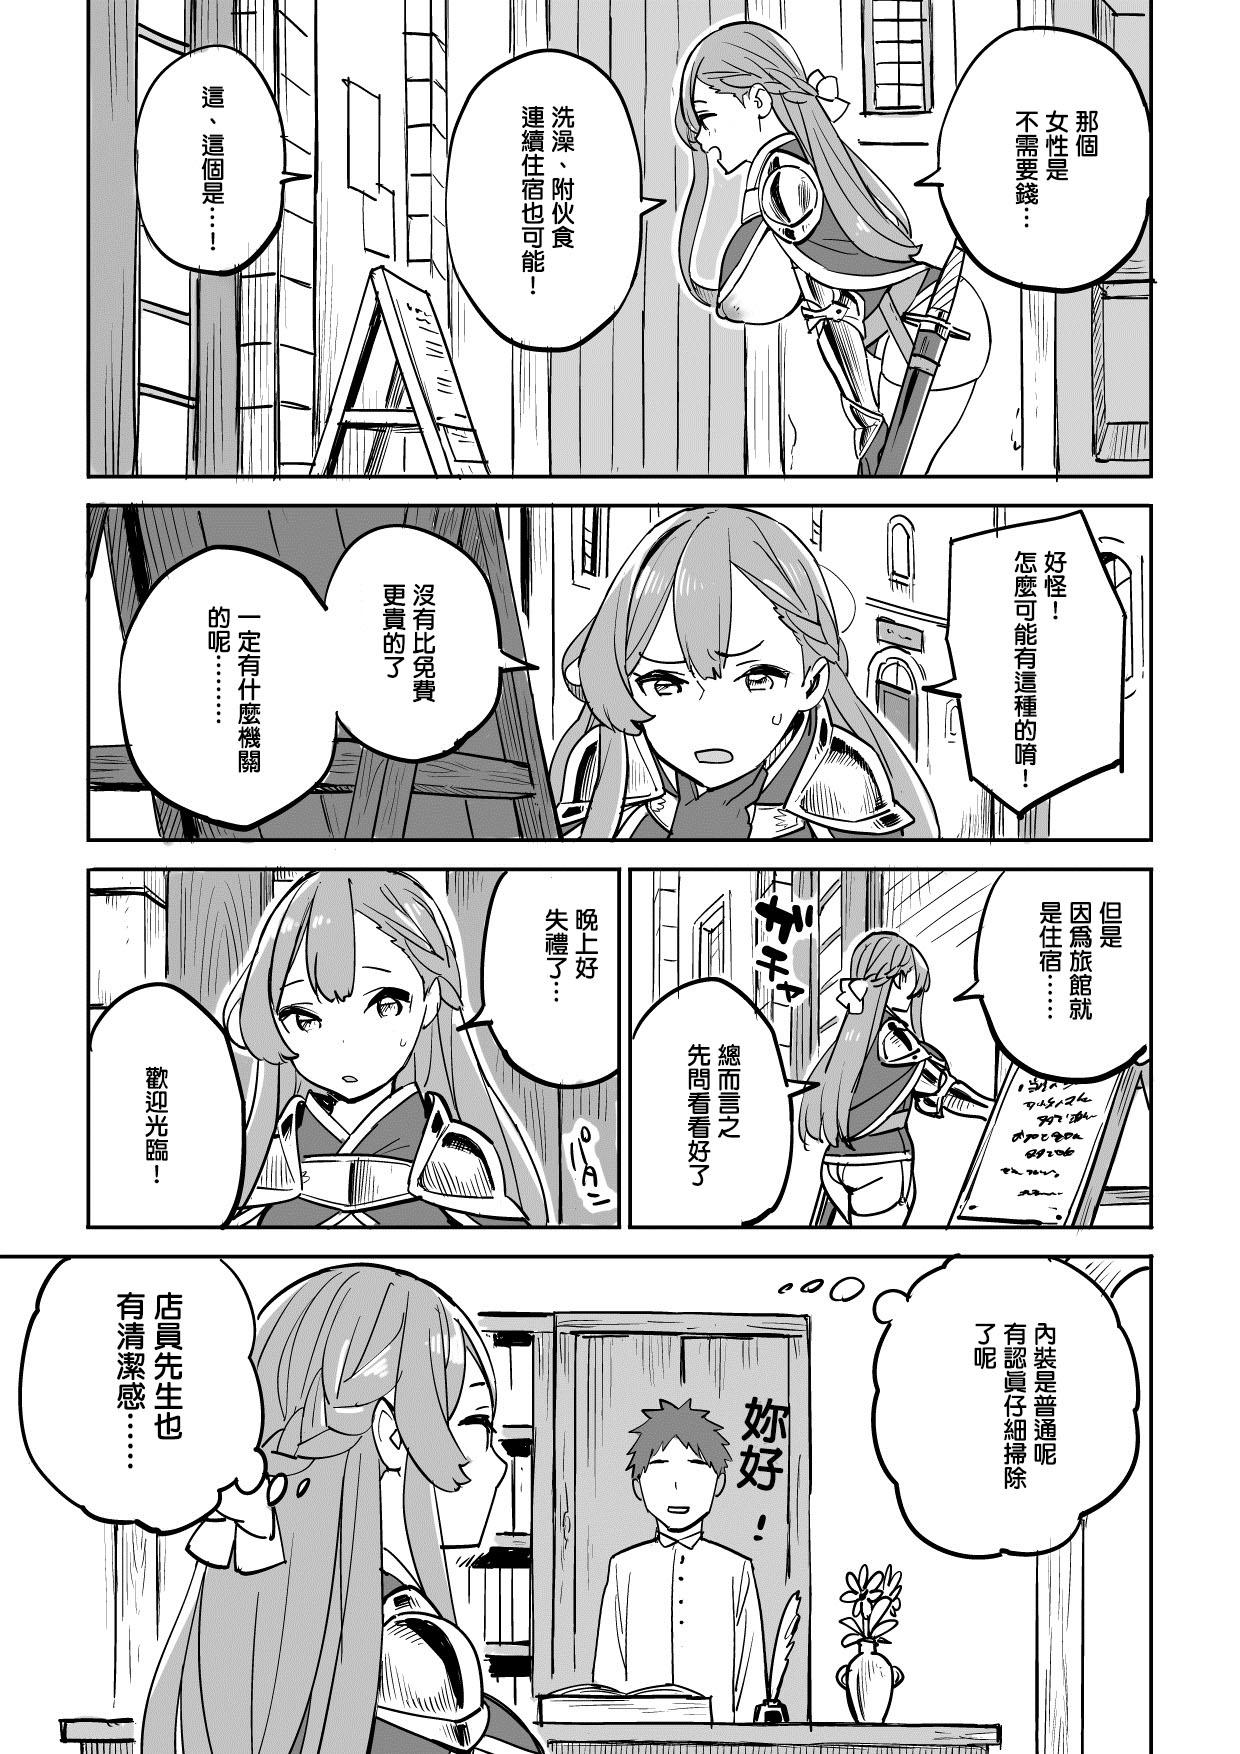 Tada no Yado ni wa Goyoujin! 6